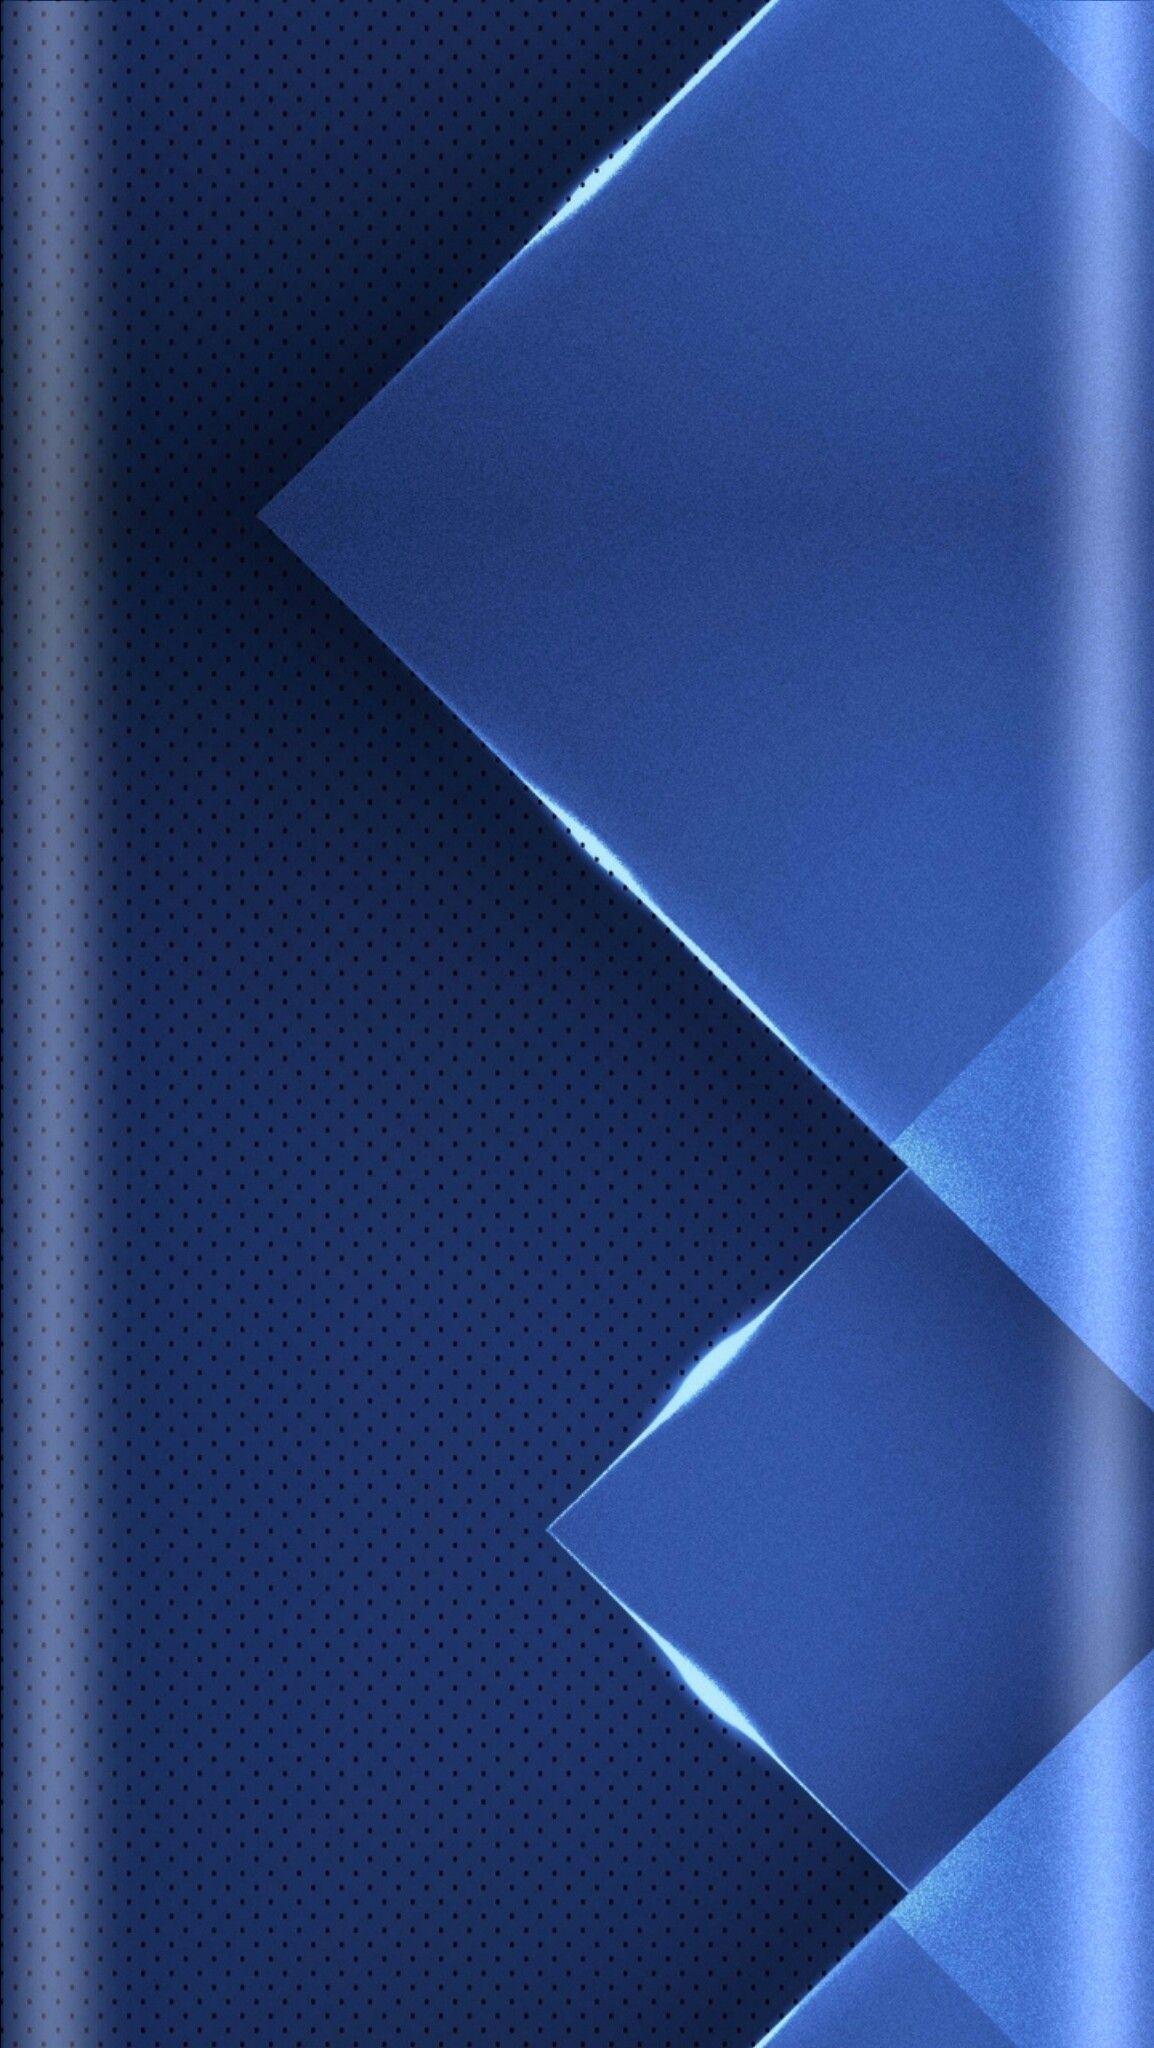 Blue Geometric Abstract Wallpaper Wallpaper edge